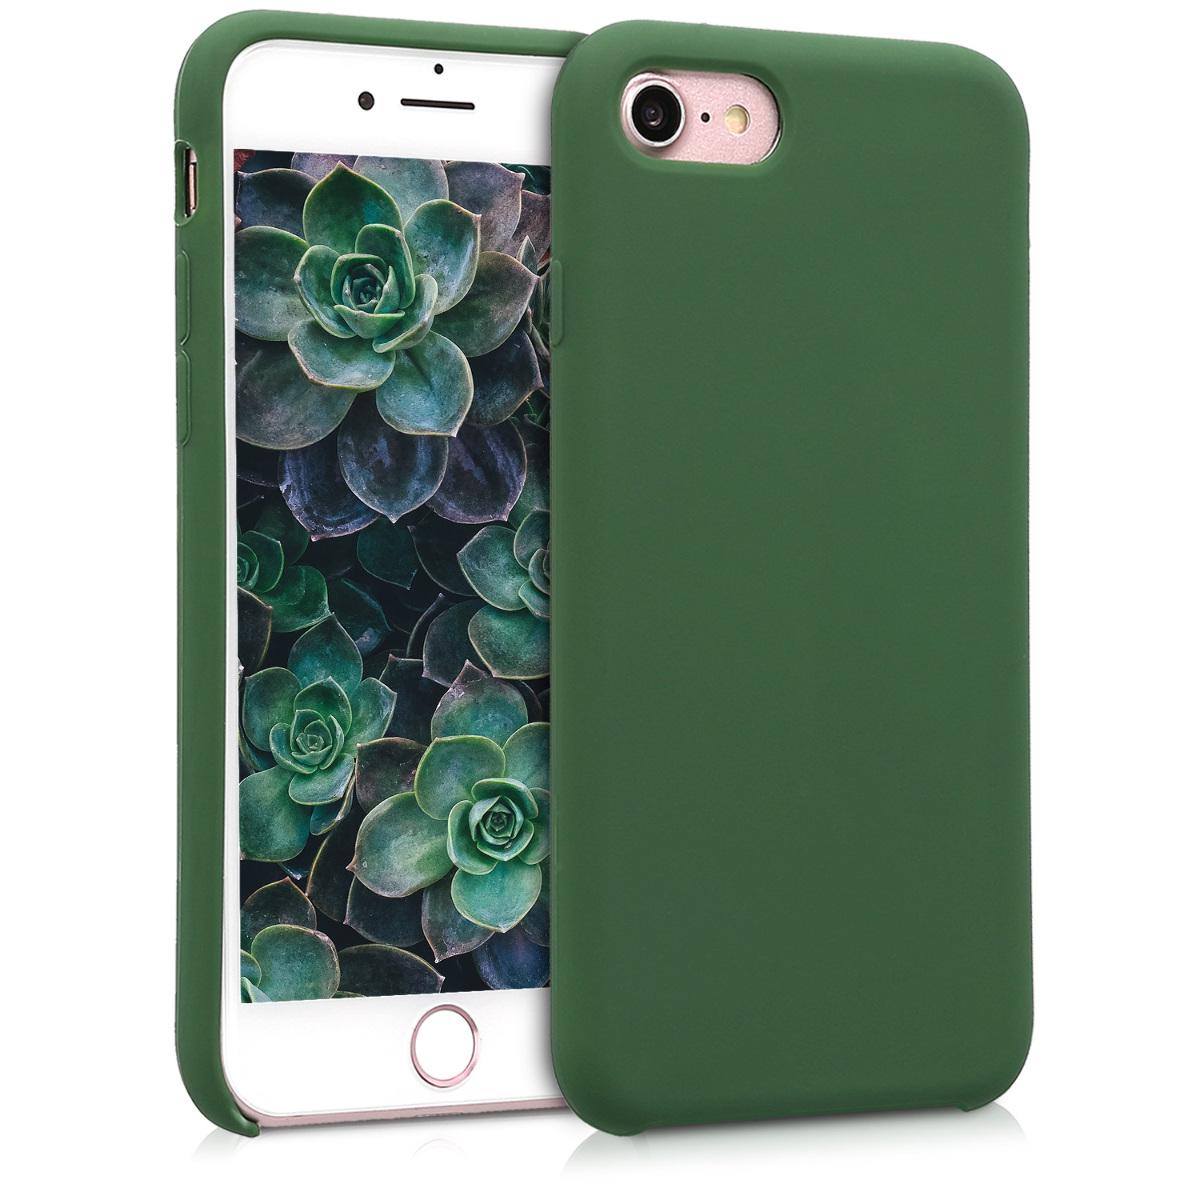 KW Θήκη Σιλικόνης iPhone 8 / 7 - Dark Green (40225.80)